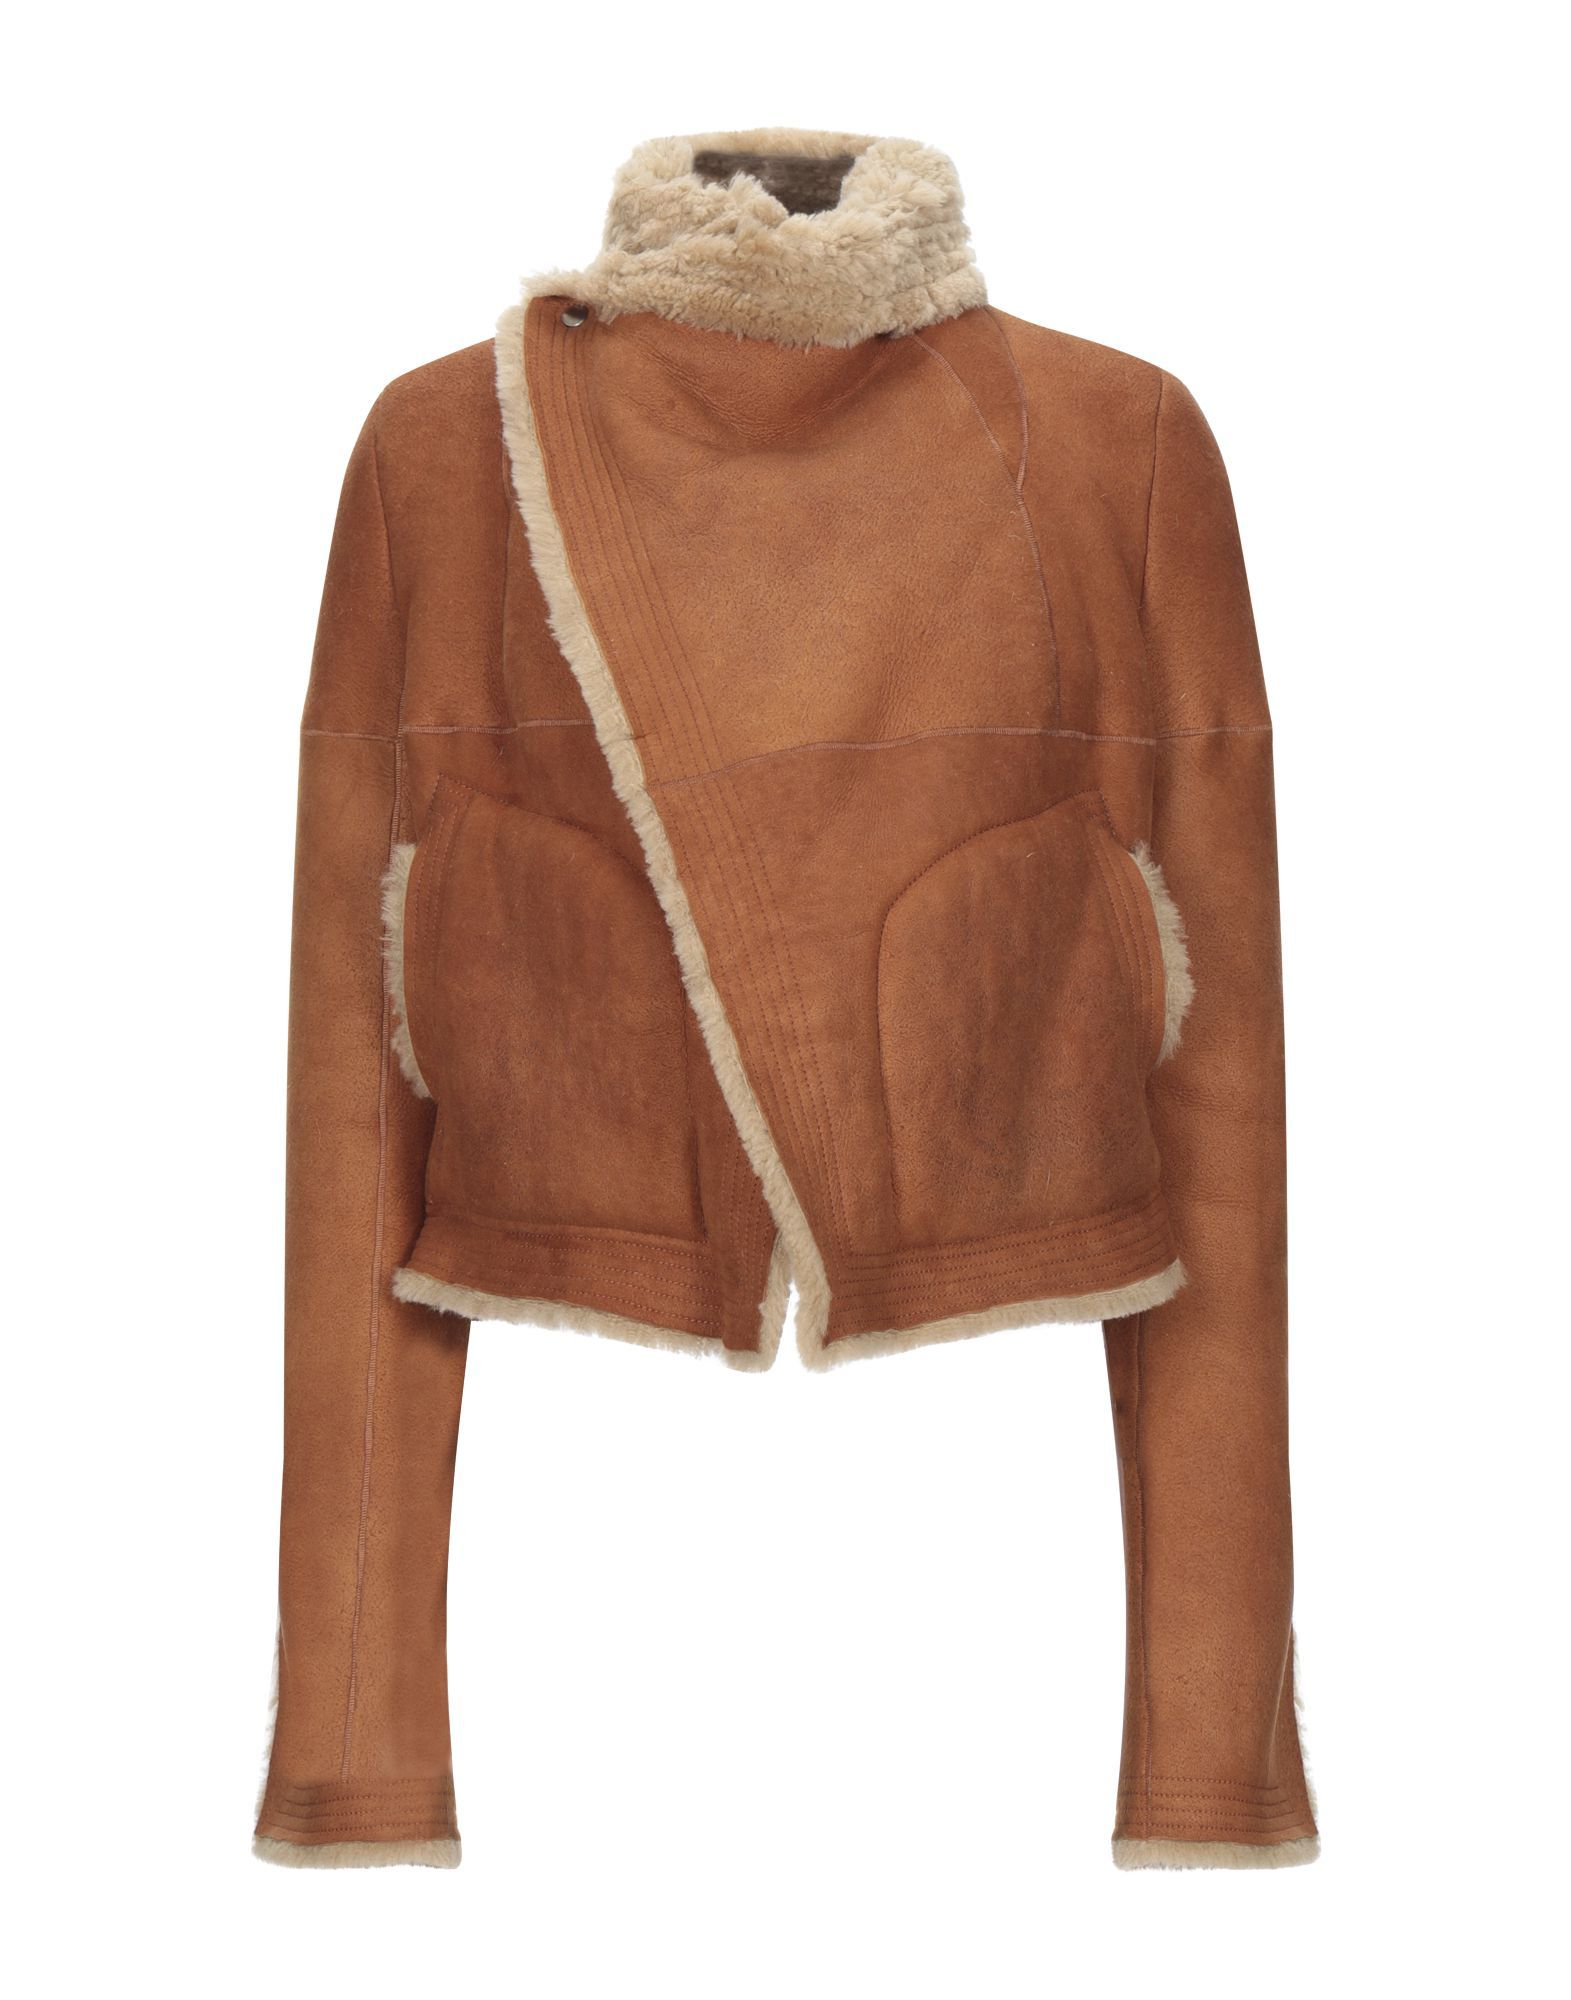 Rick Owens Camel Sheepskin Jacket